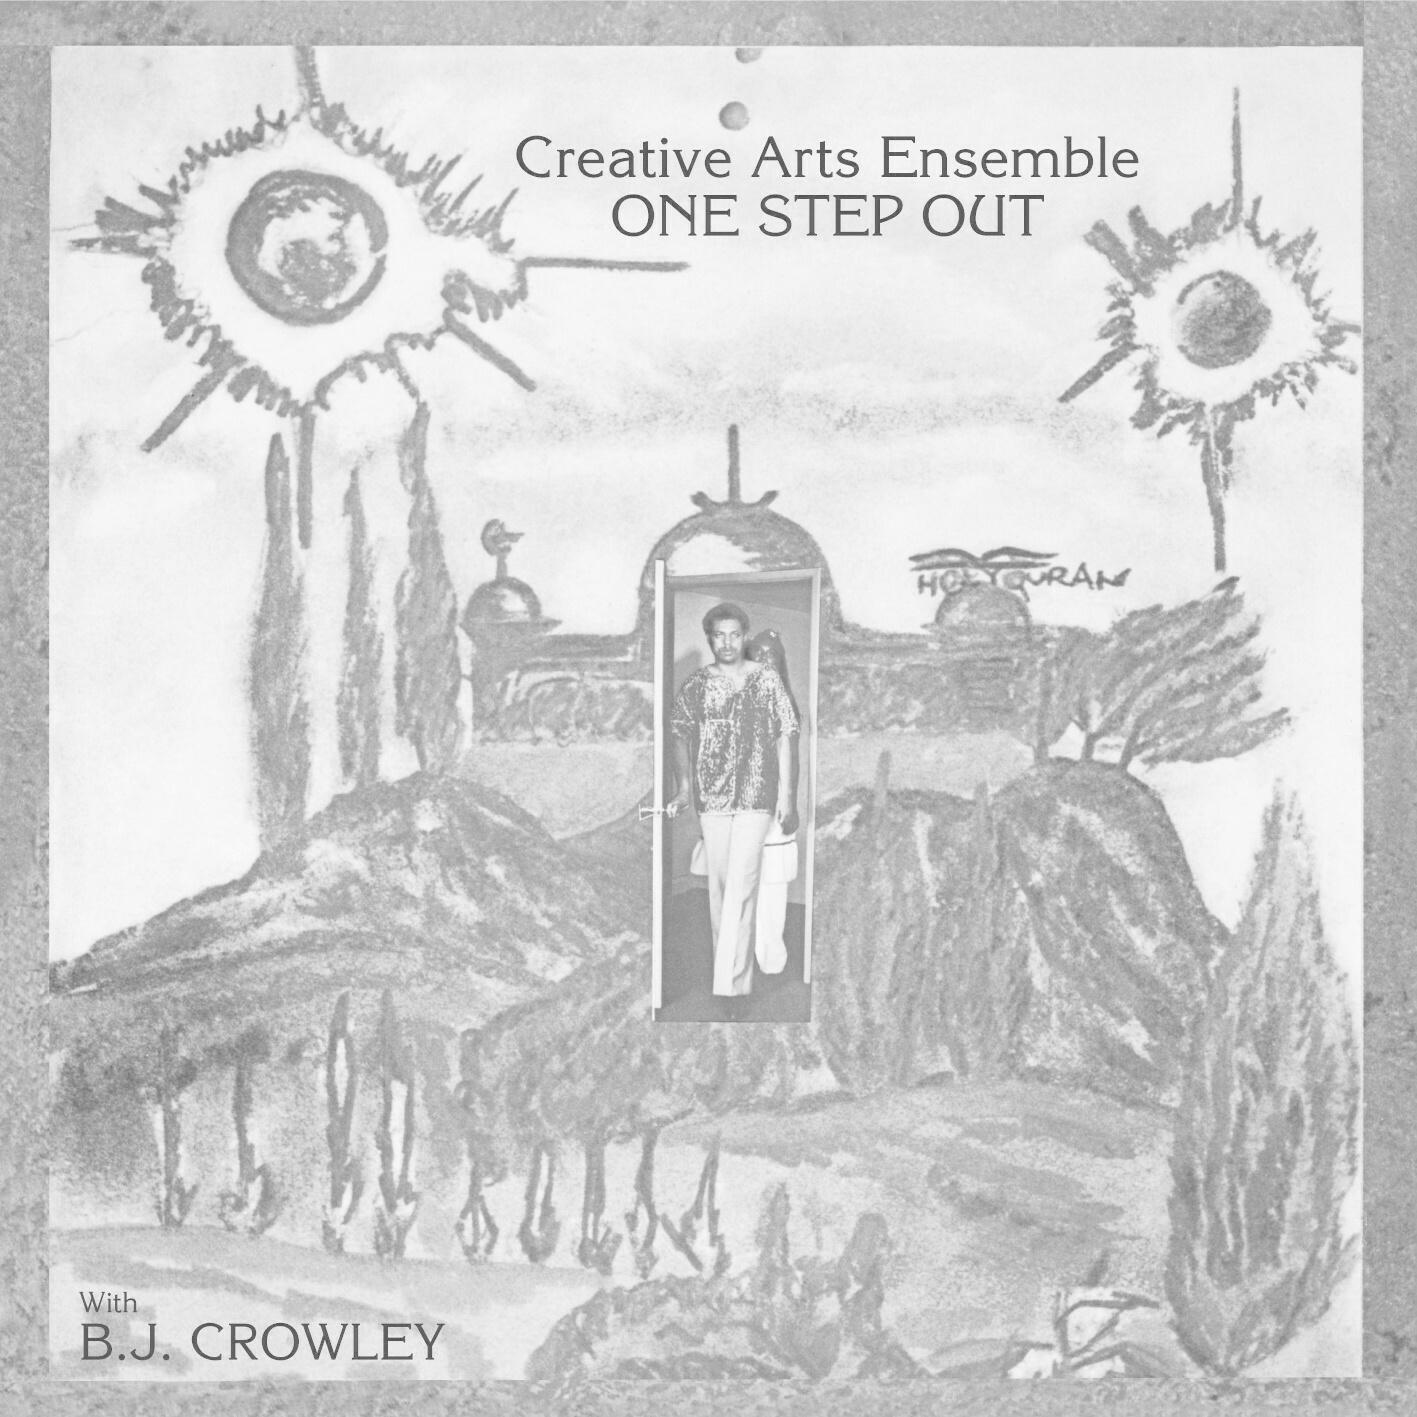 Jazz Creative Arts Ensemble - One Step Out (Pure Pleasure Audiophile Reissue)